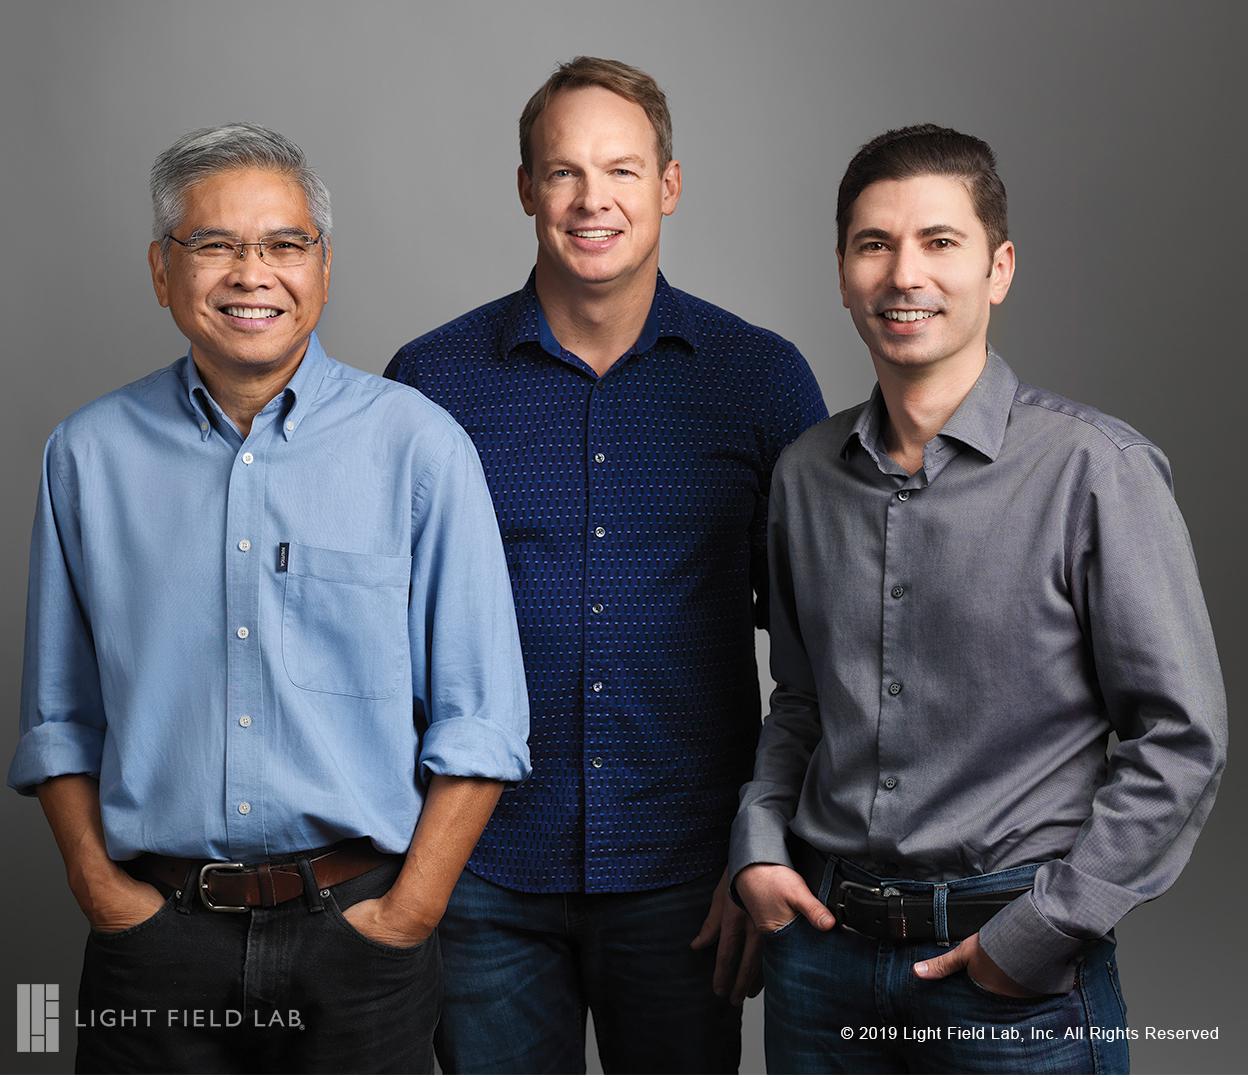 Light Field Lab, Inc. co-founders (L-R) Ed Ibe, VP Engineering, Brendan Bevensee, CTO and Jon Karafin, CEO